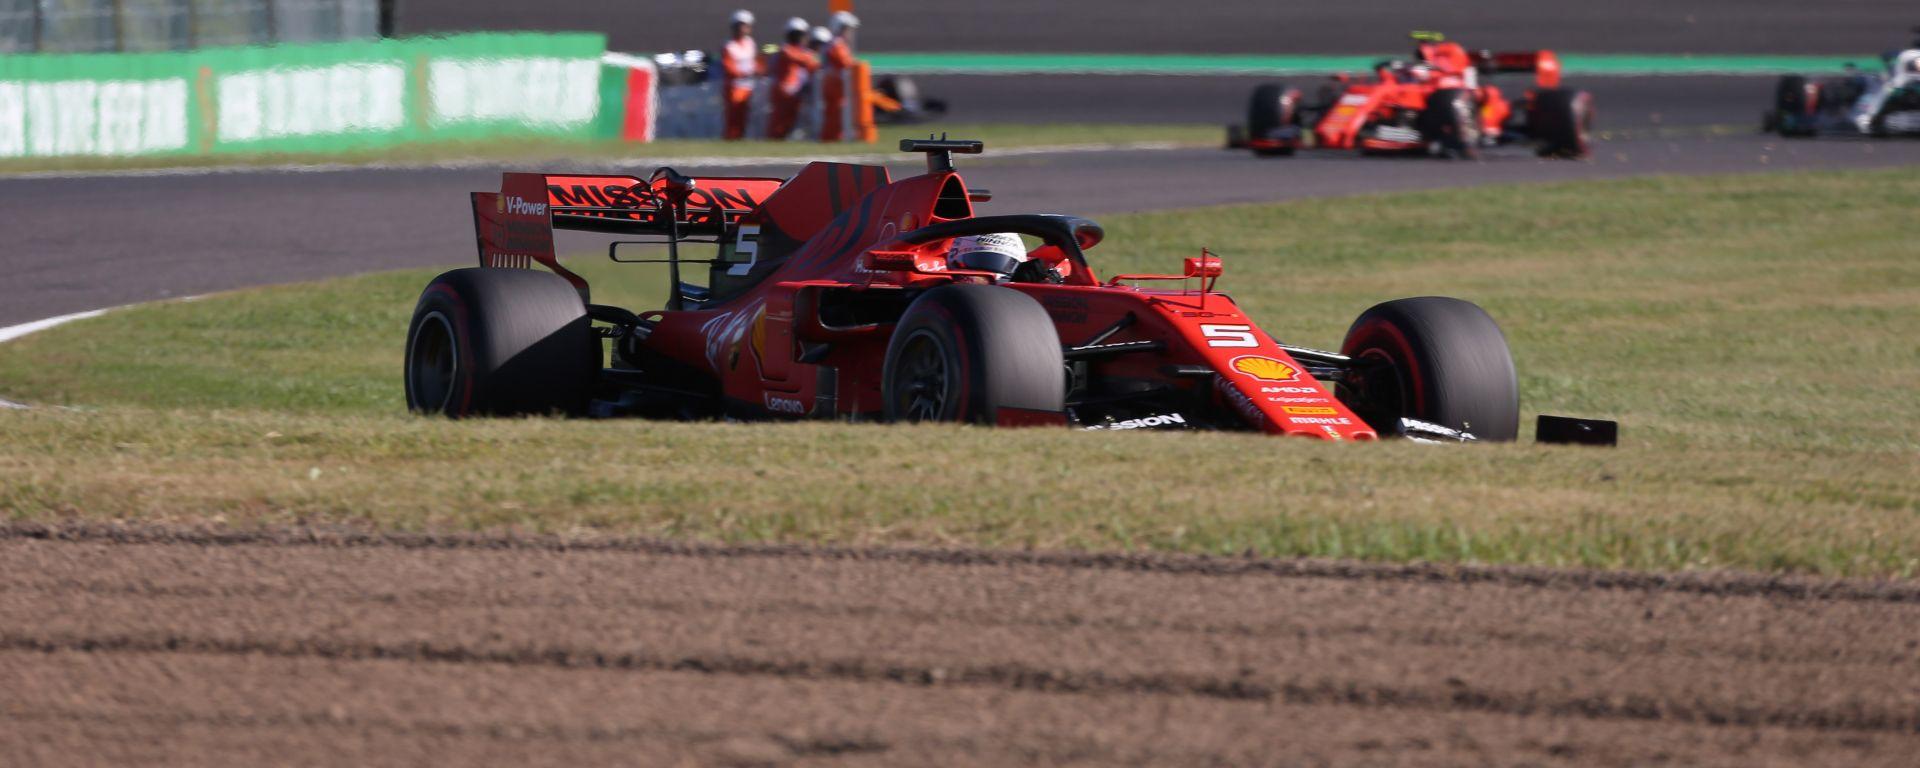 F1, GP Giappone 2019: Sebastian Vettel e Charles Leclerc (Ferrari) seguiti da Lewis Hamilton (Mercedes)